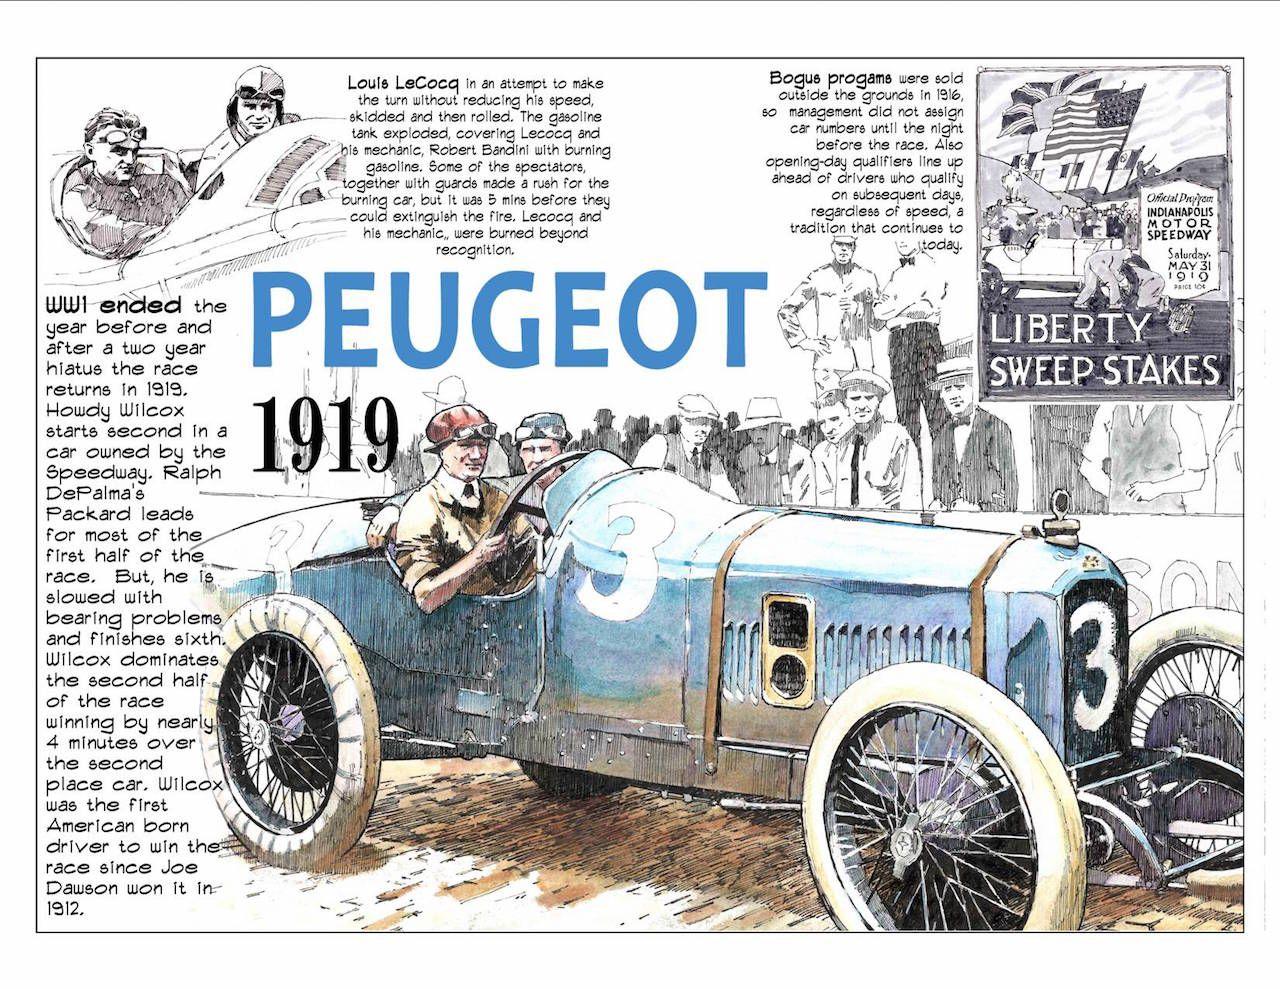 1919 indy 500 winner howdy wilcox in the peugeot race car